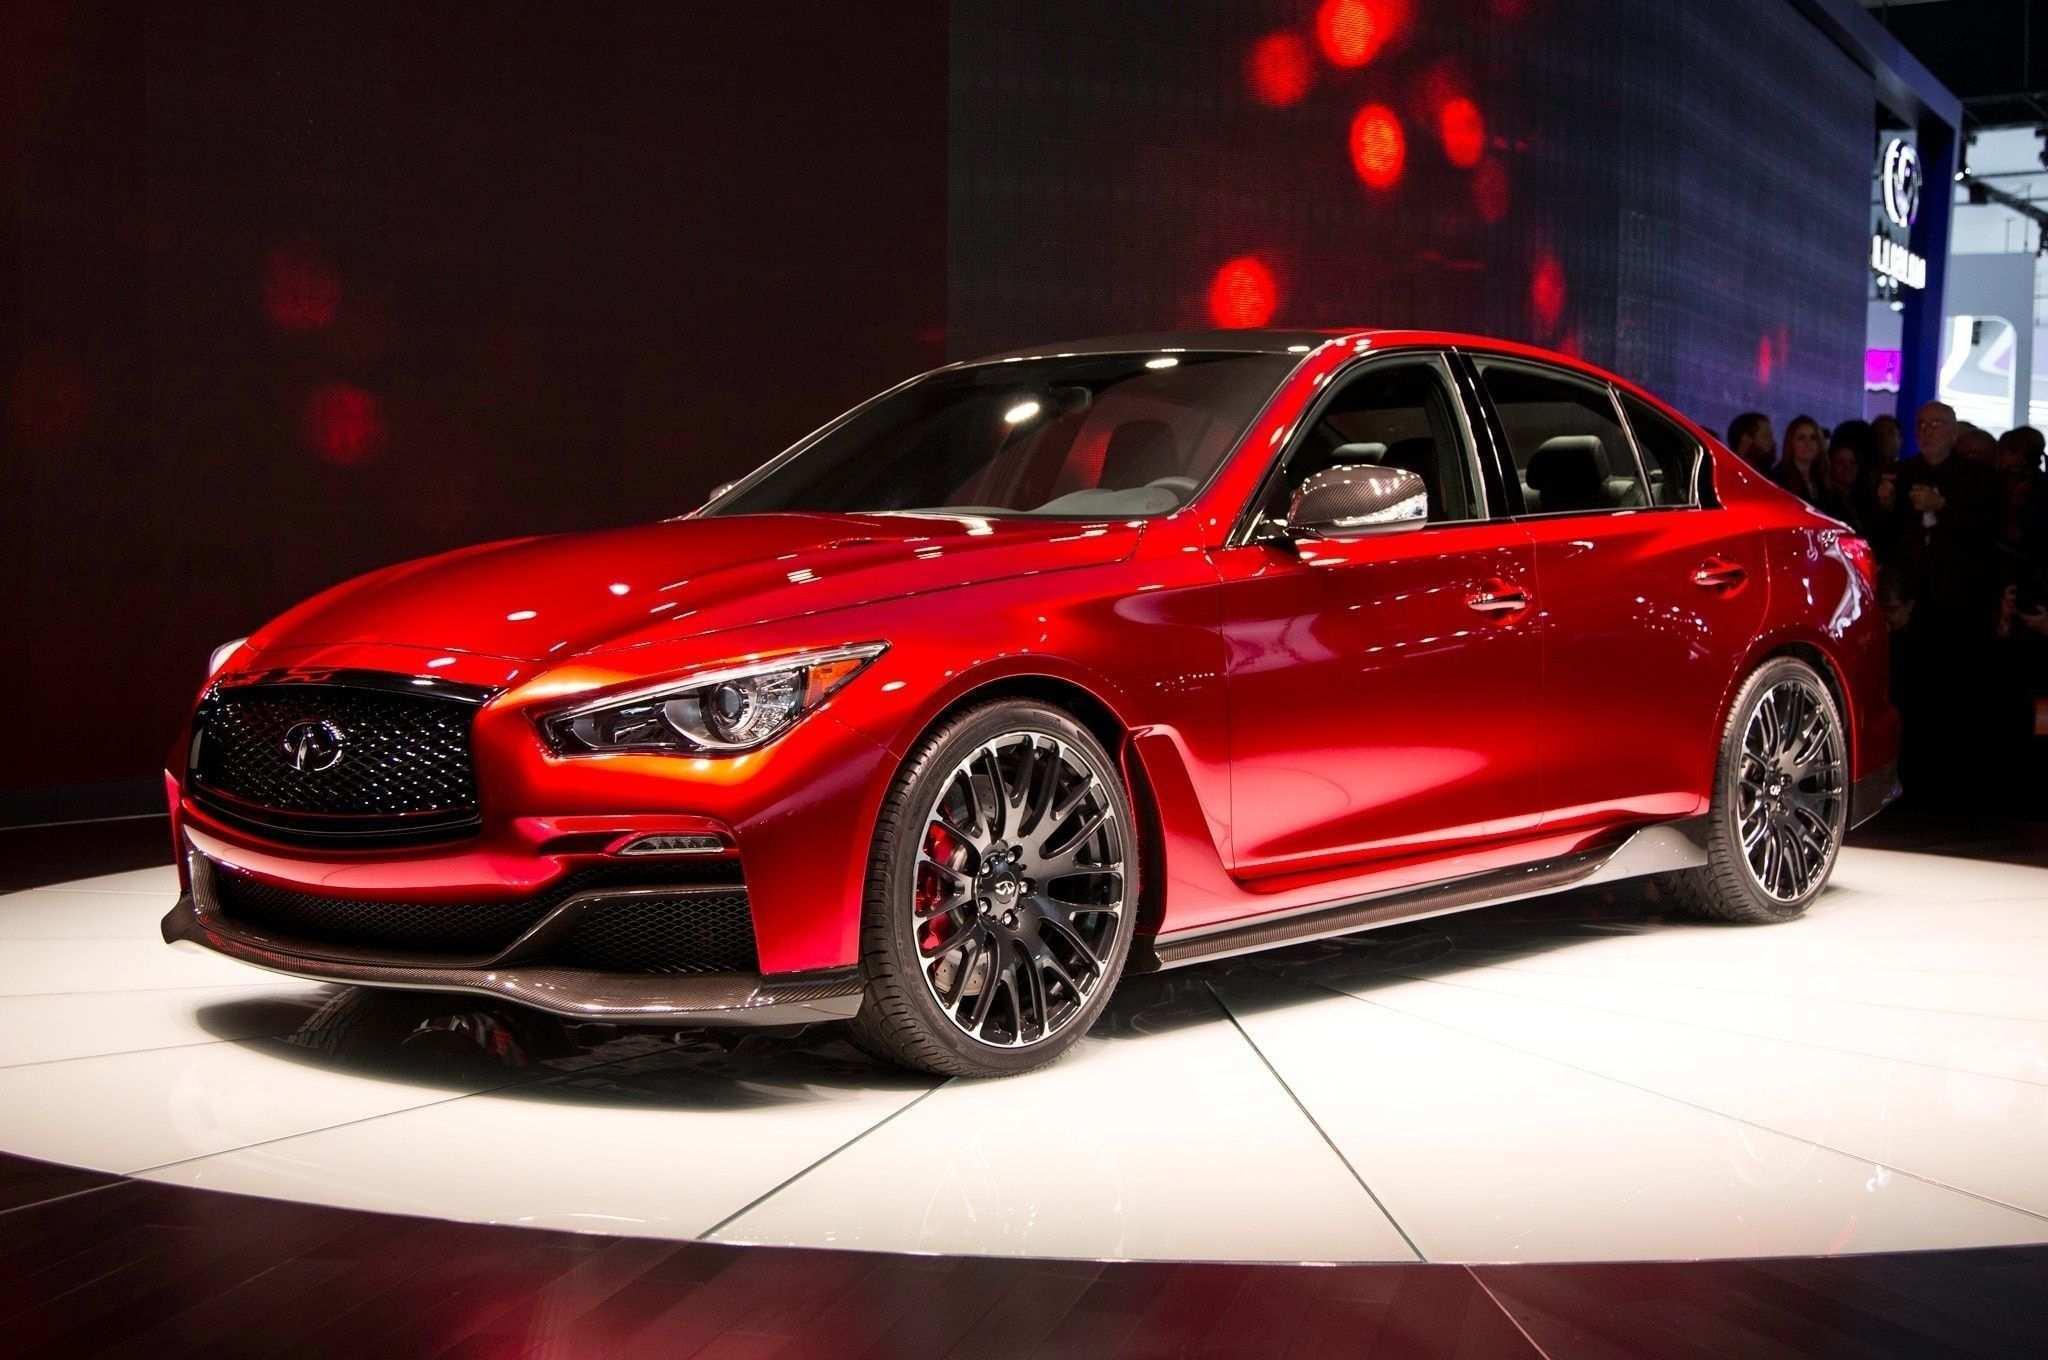 49 Best Review 2020 Infiniti Q50 Coupe Eau Rouge History with 2020 Infiniti Q50 Coupe Eau Rouge